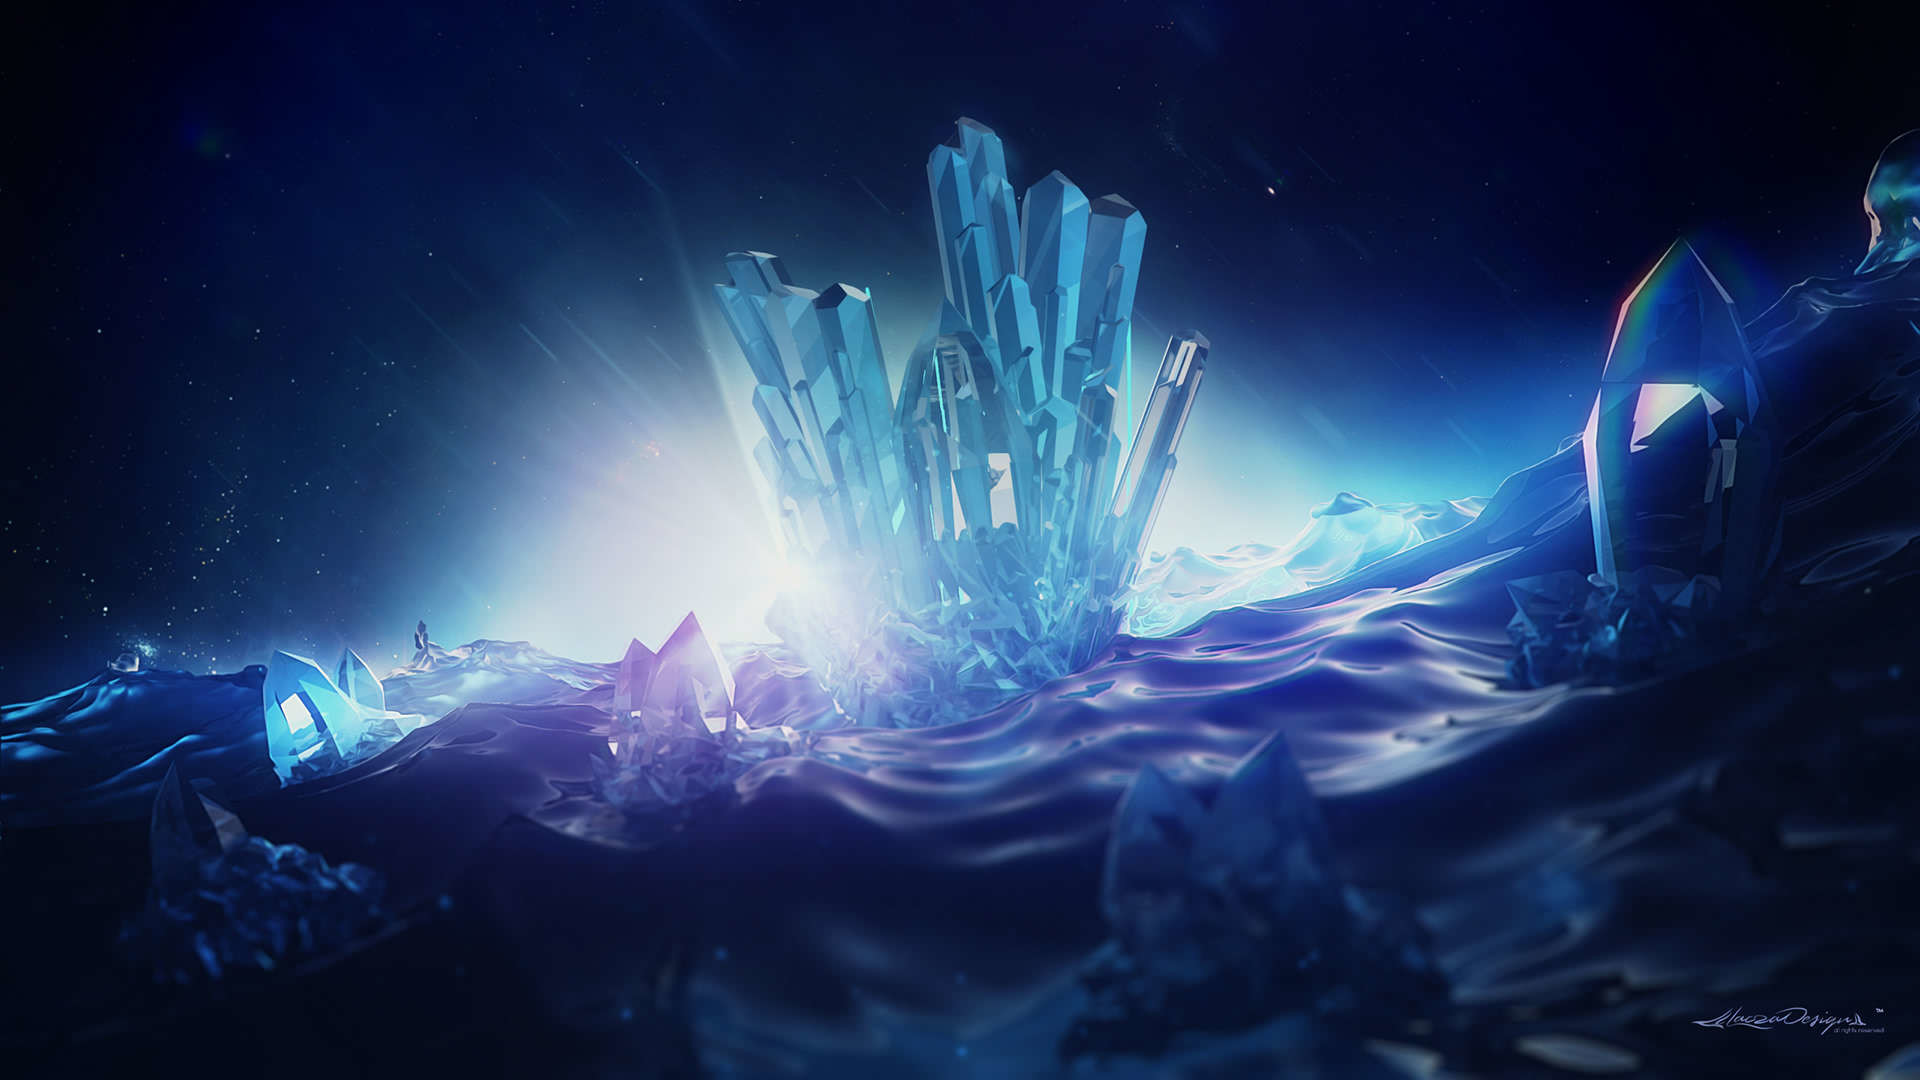 Res: 1920x1080, Minimal Artistic Crystal Wallpaper